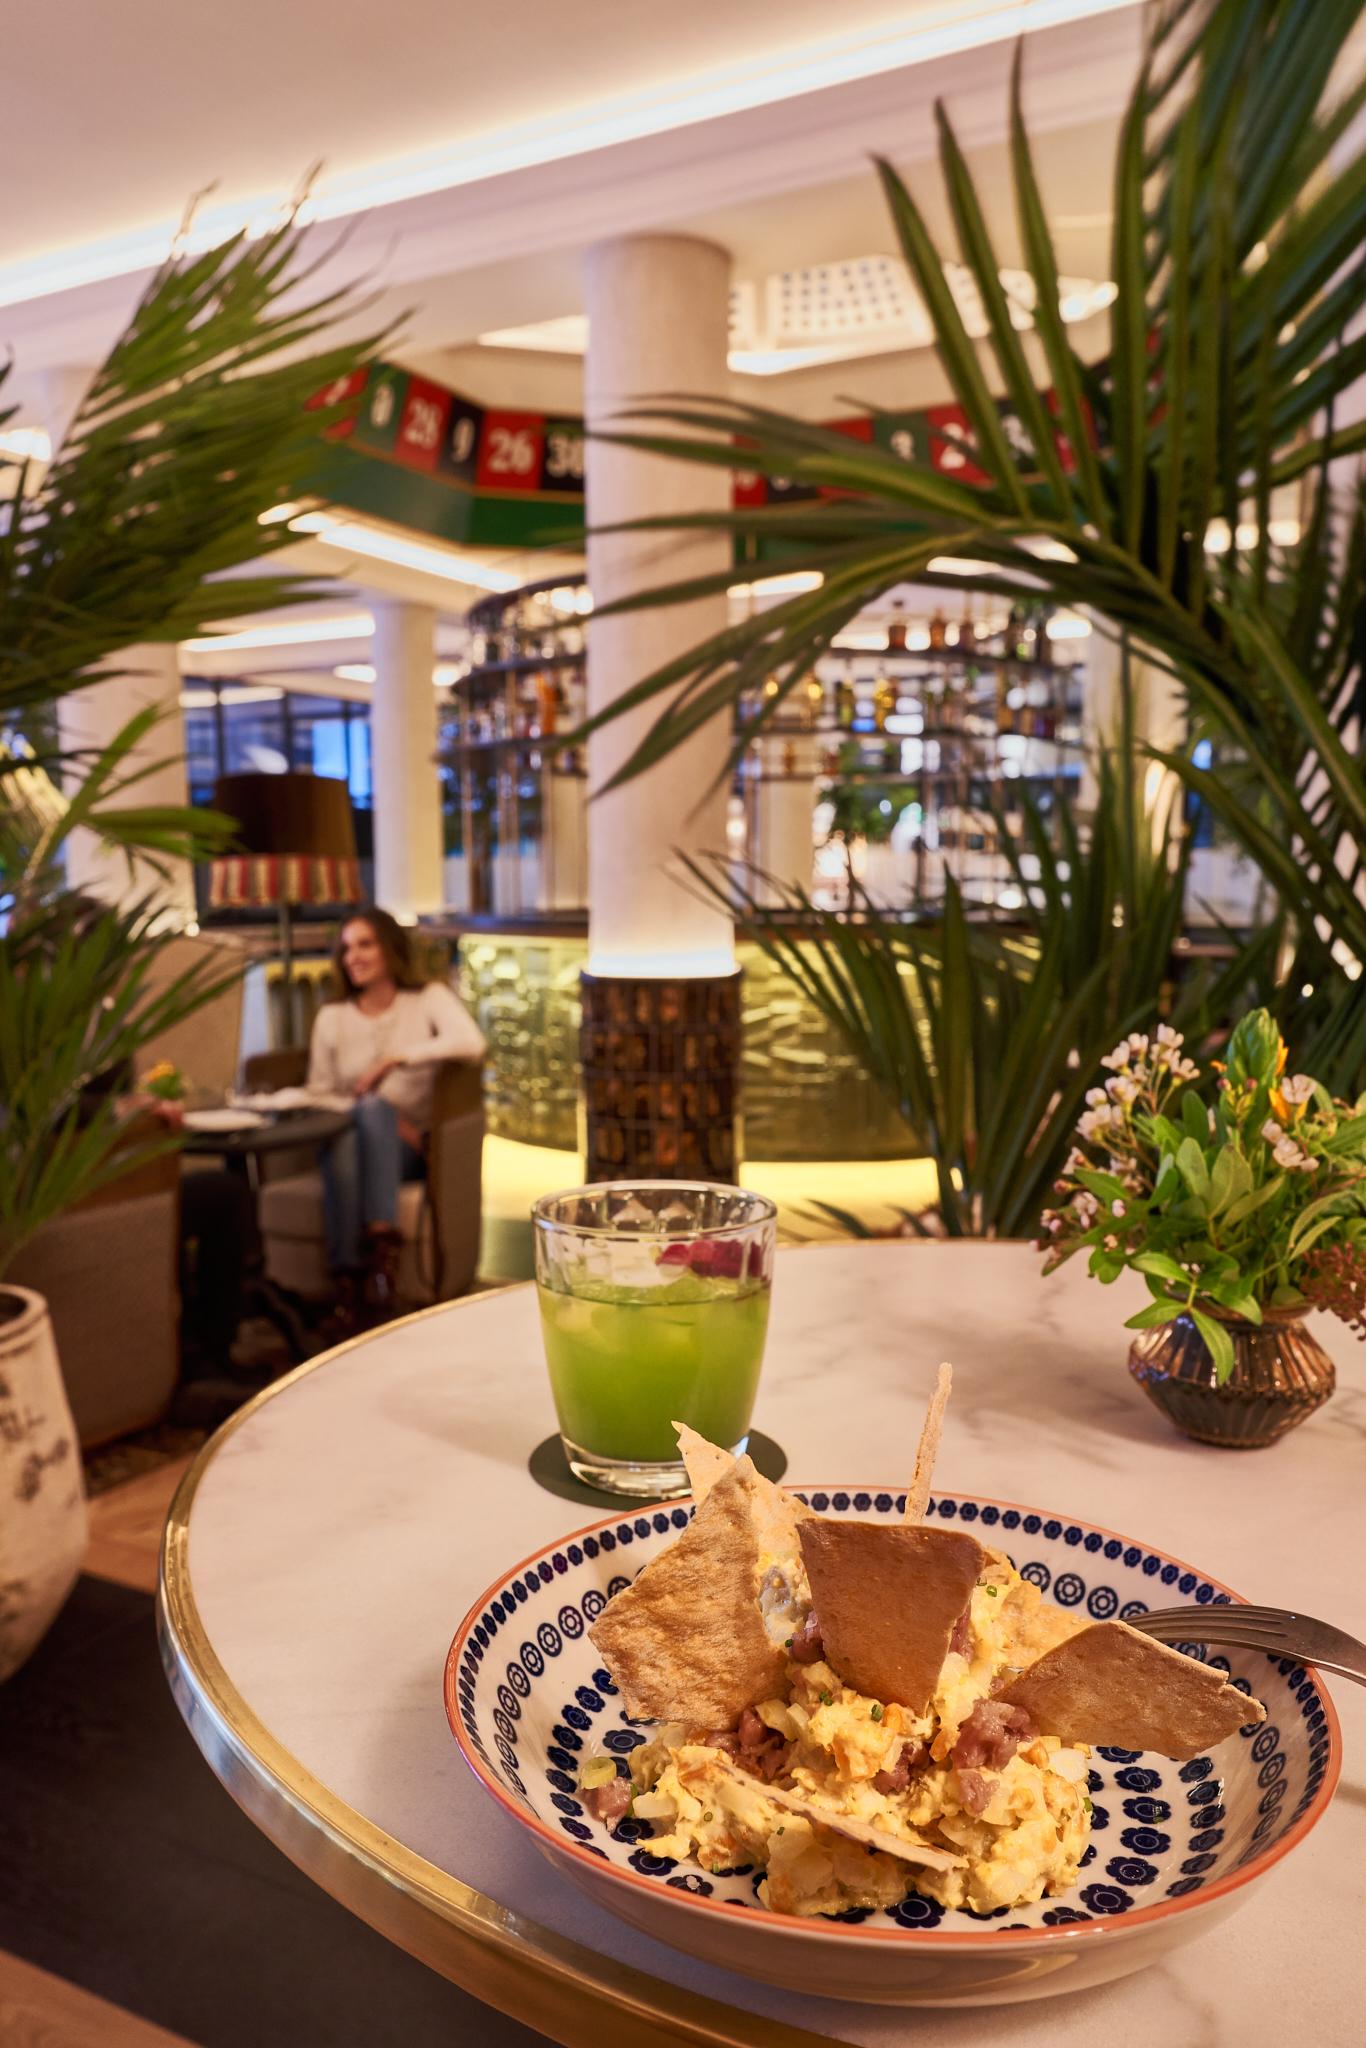 Propuesta gastronómica de Versus Lively Lounge del Bless Hotel Madrid